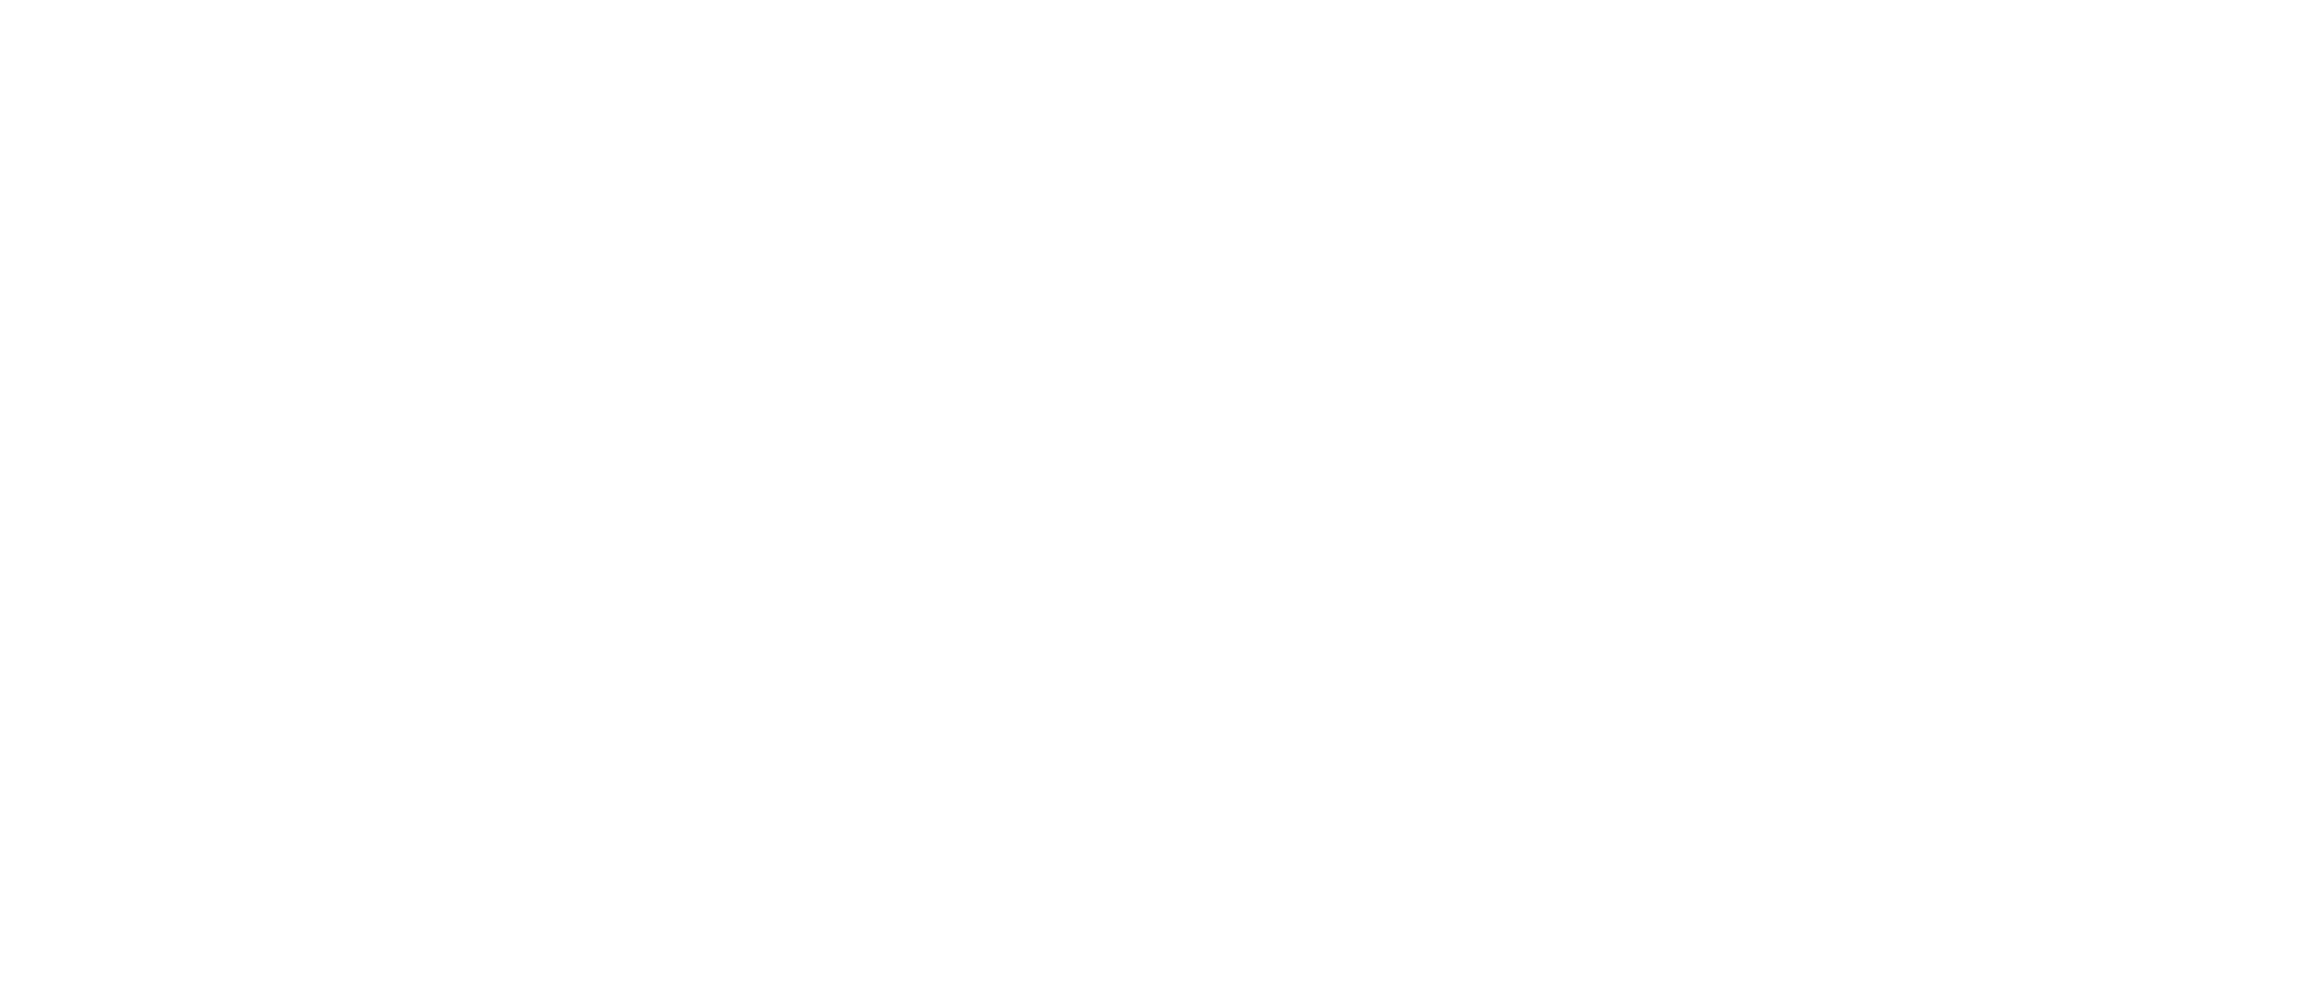 Building On It: Using the Engagement Bridge to Reshape Employee Engagement Strategies